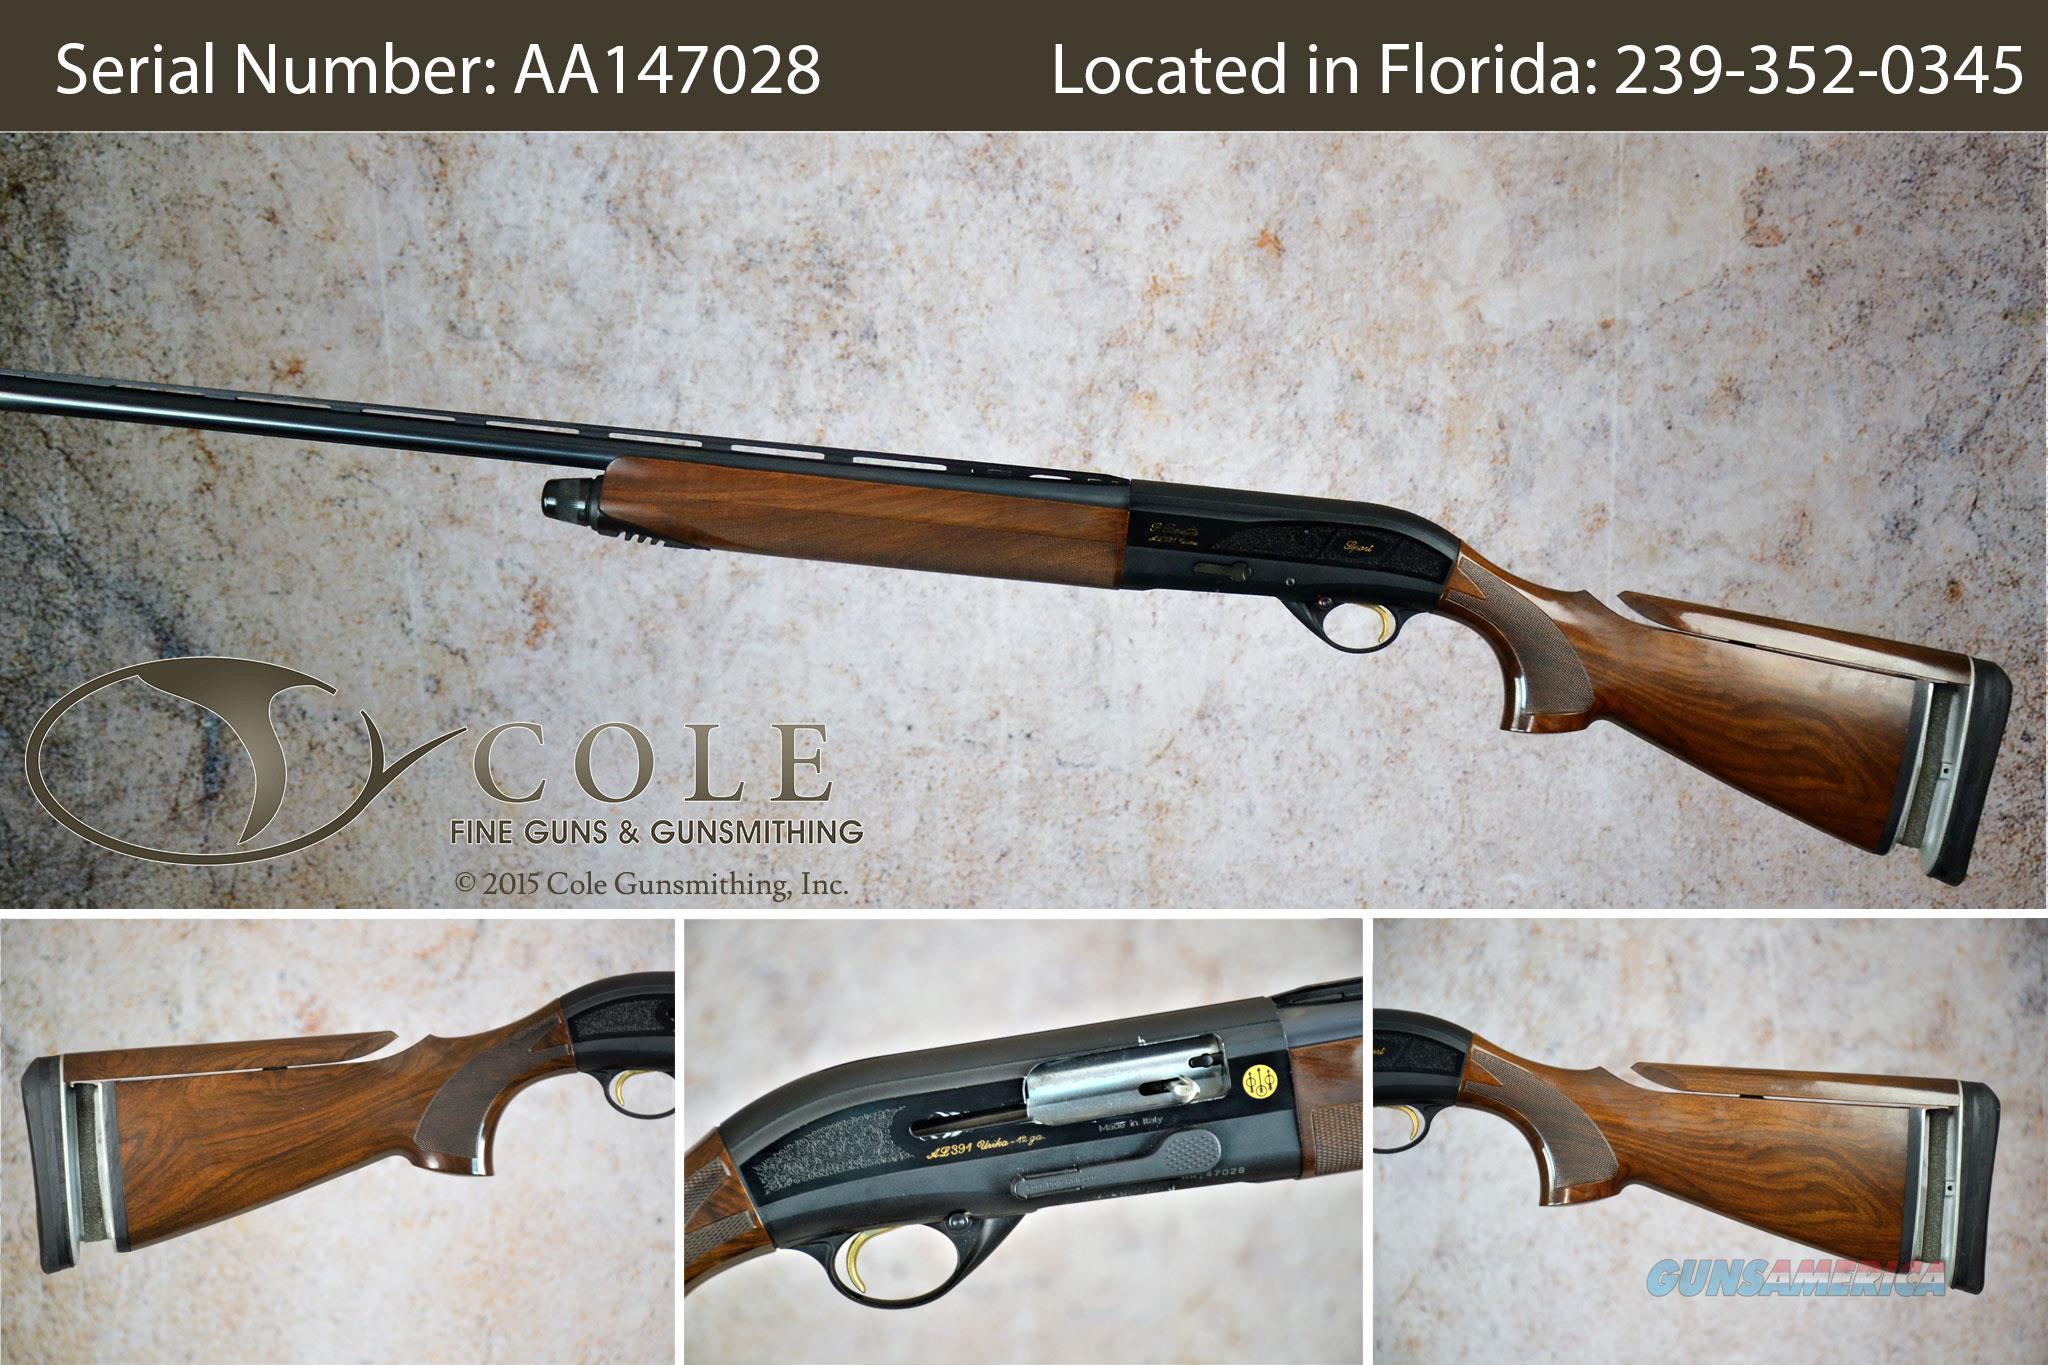 "Beretta 391 Urika Sporting 12g 30"" SN:#AA147028~~Pre-Owned~~  Guns > Shotguns > Beretta Shotguns > Single Barrel"